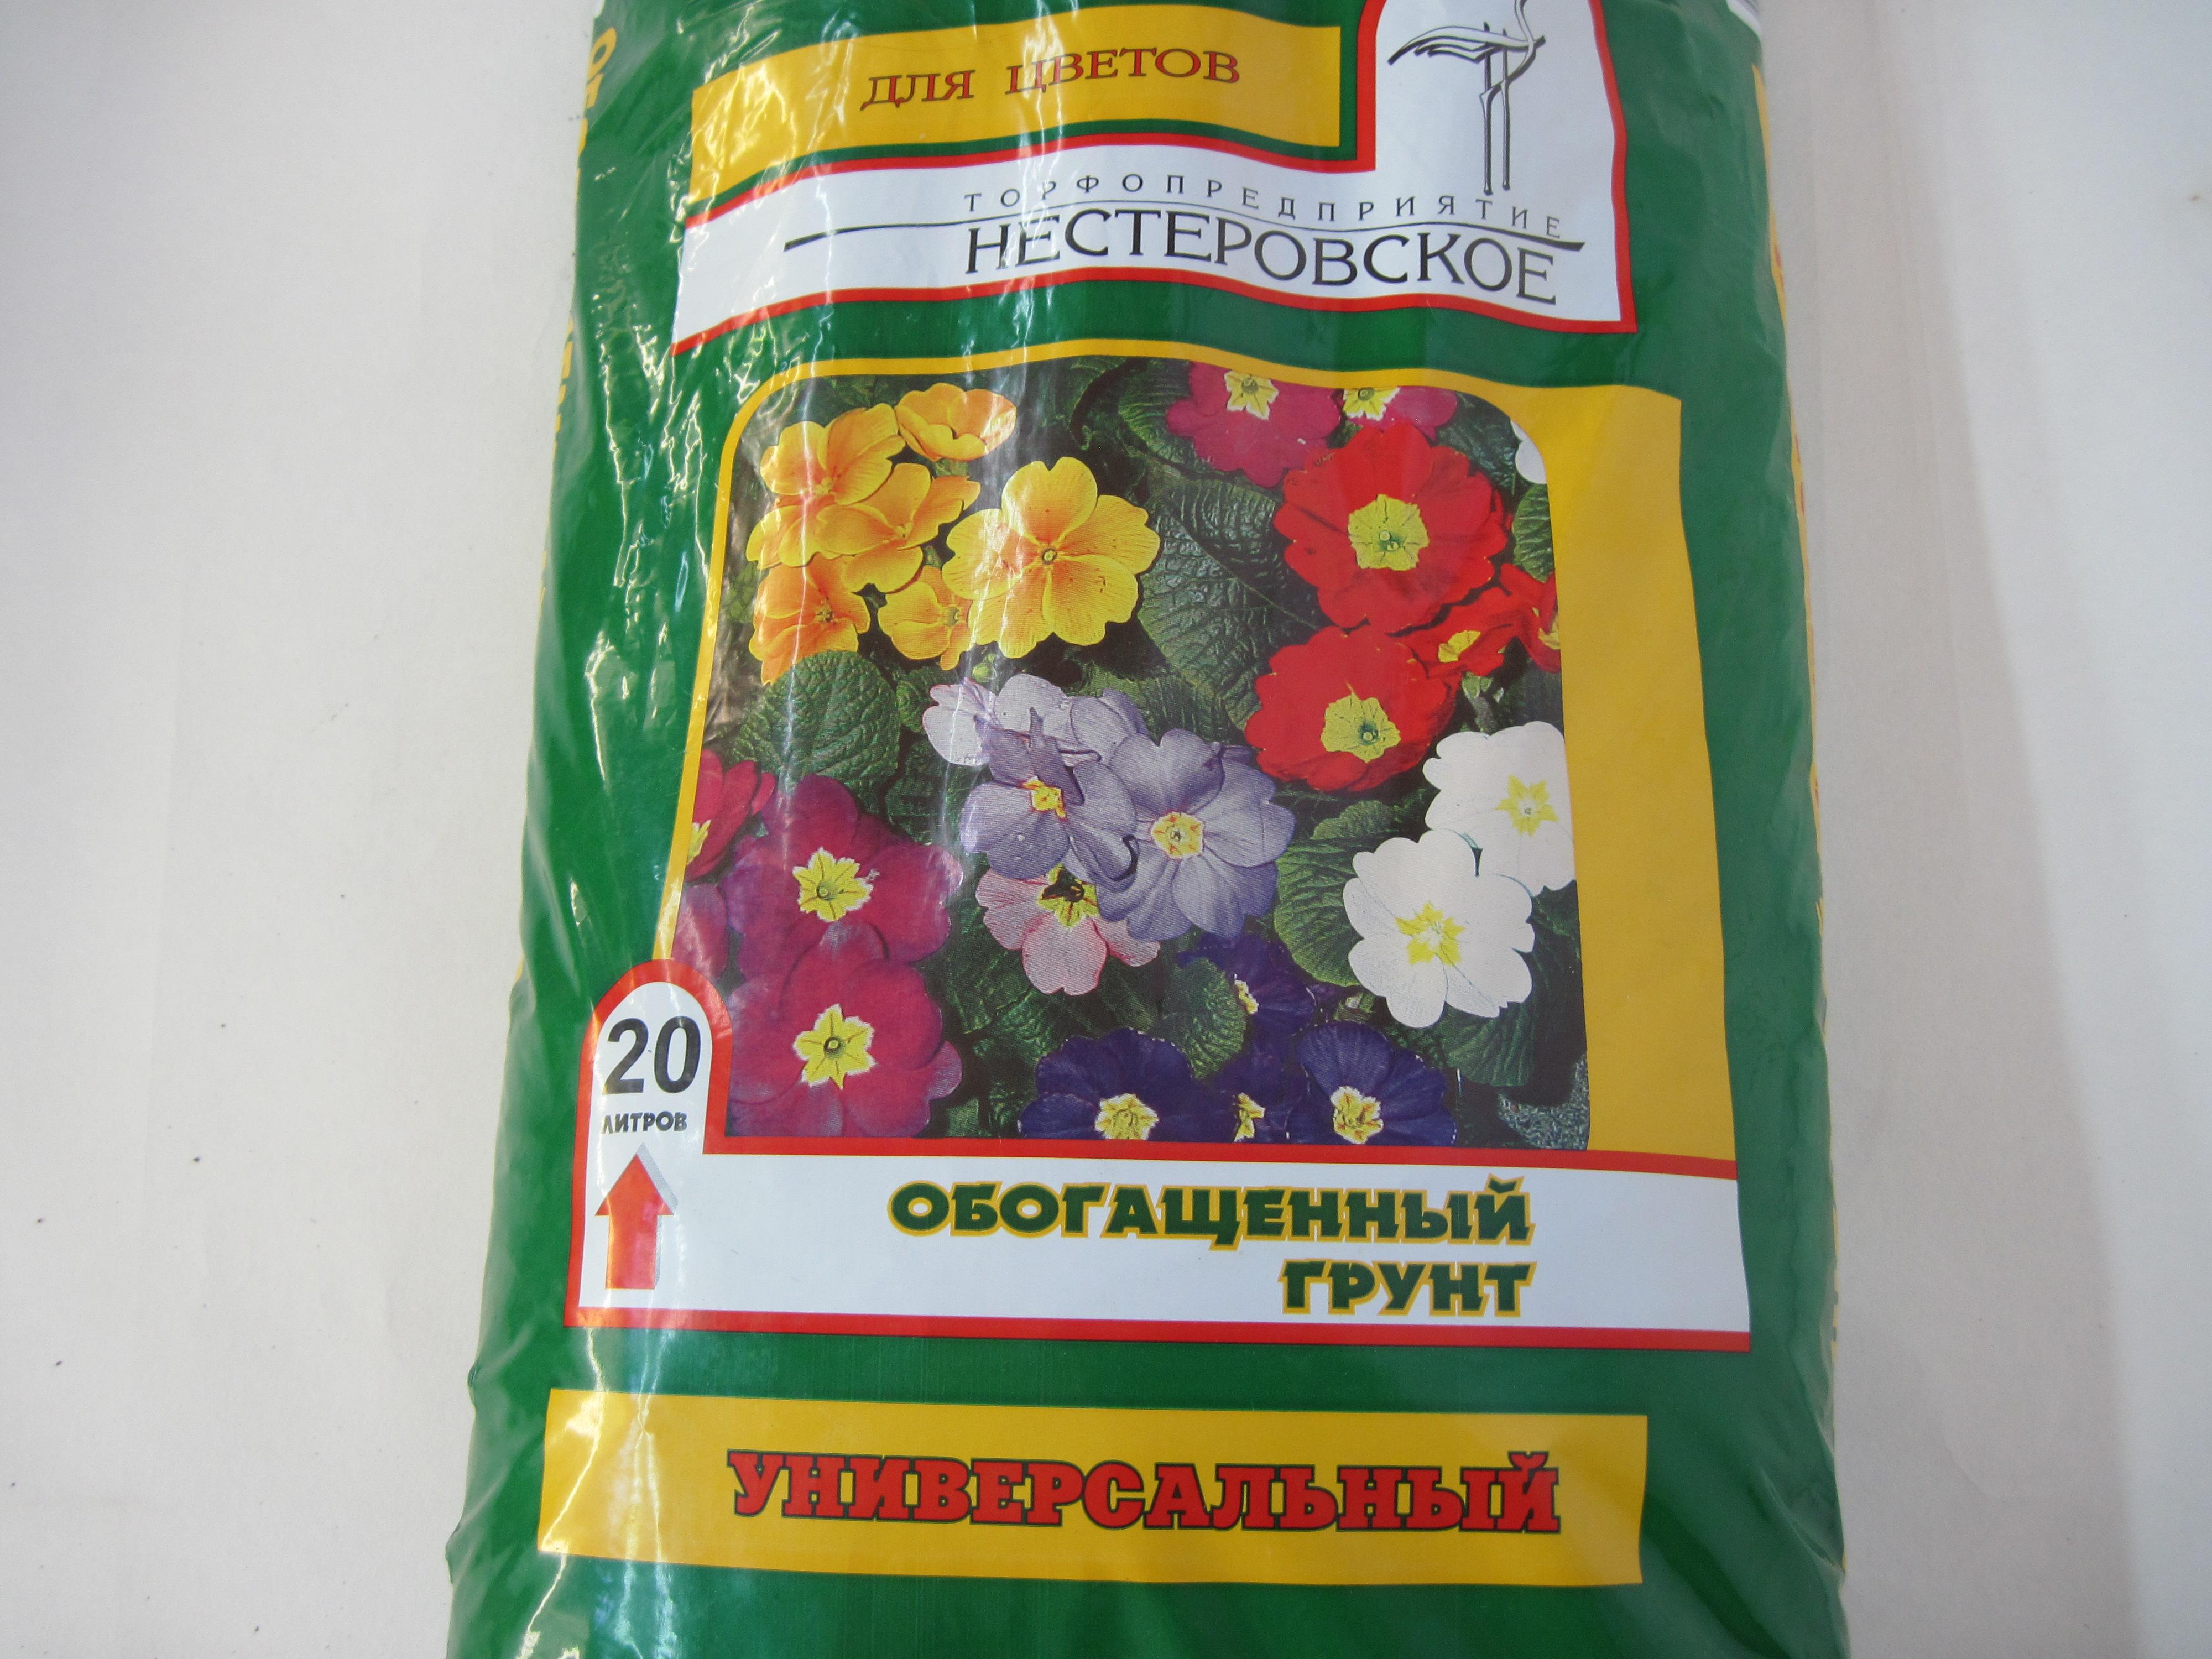 Грунт для орхидеи фаленопсис какой нужен? 9